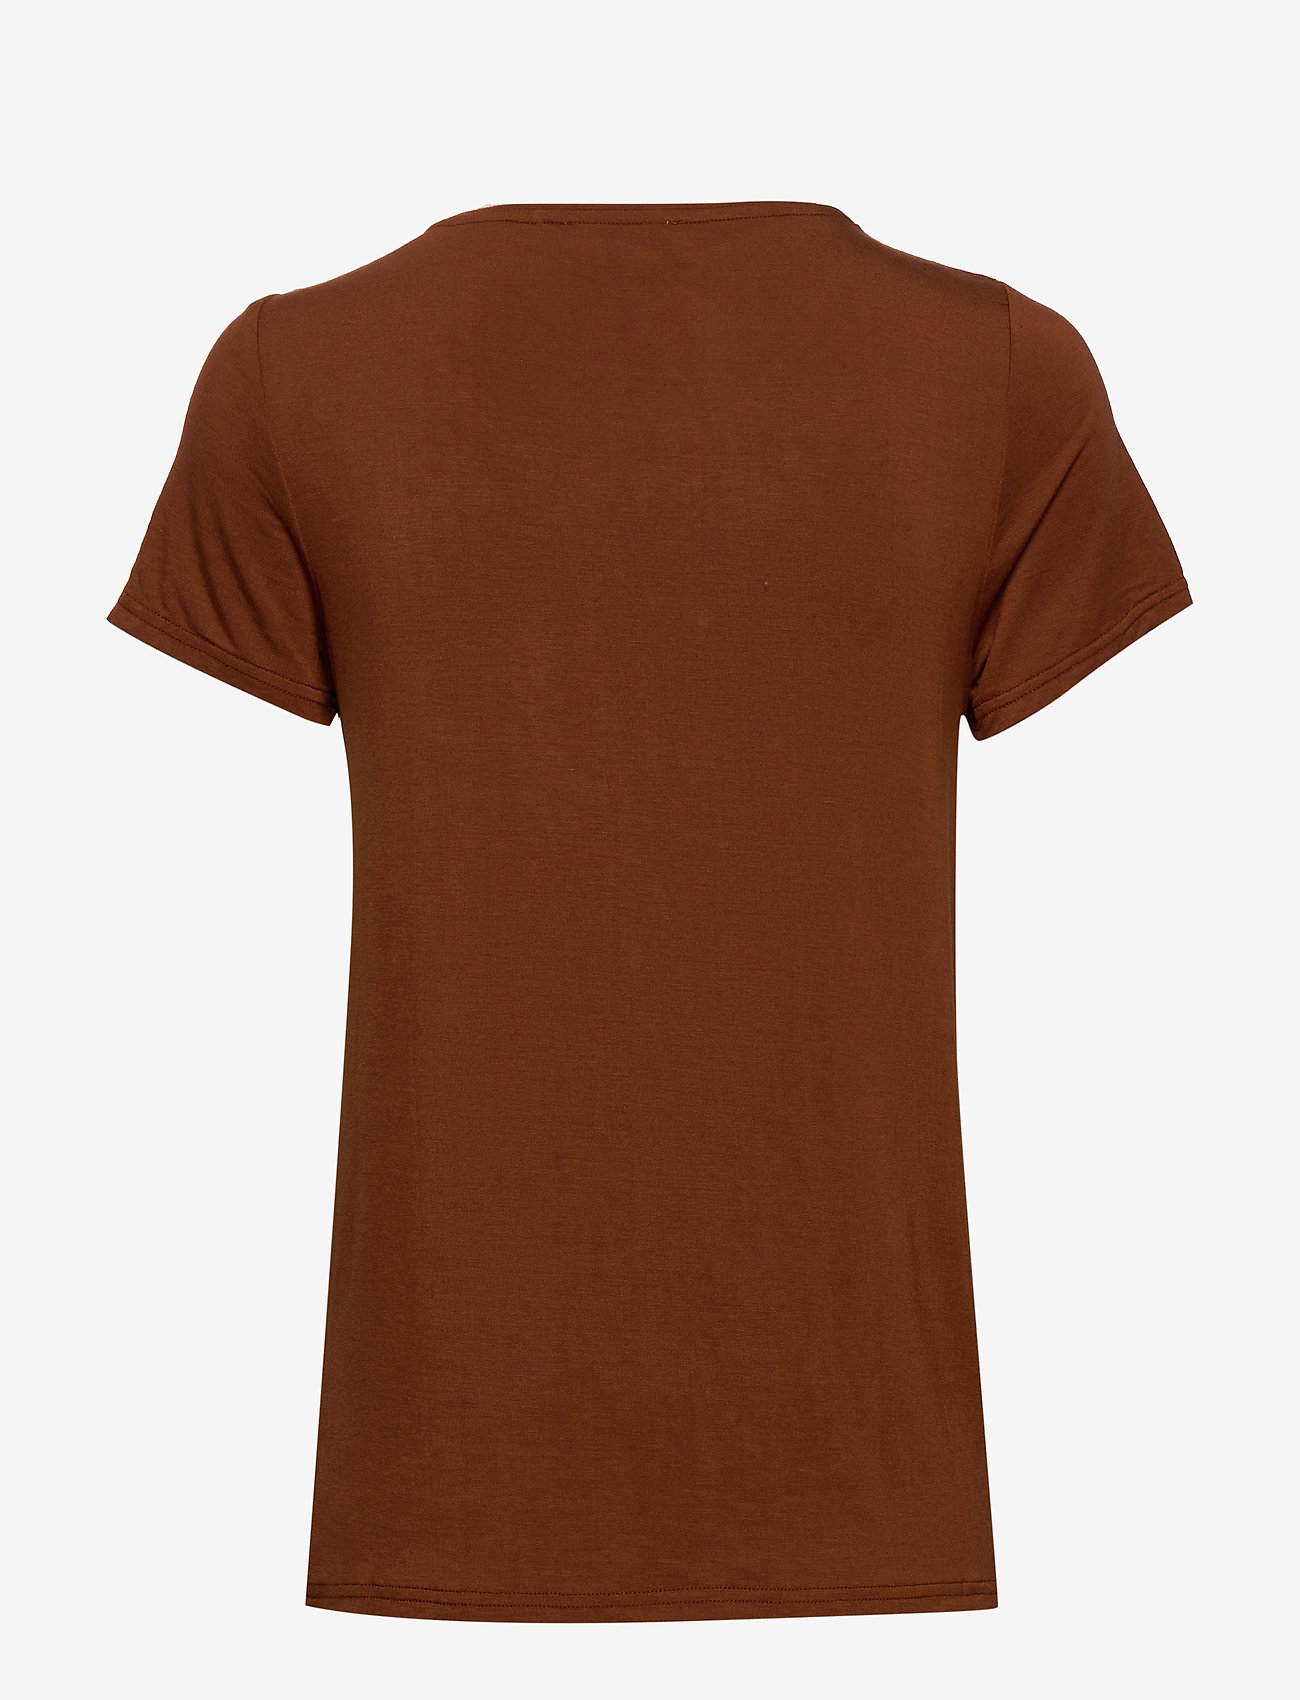 Rosemunde - T-shirt ss - t-shirts - amber brown - 1